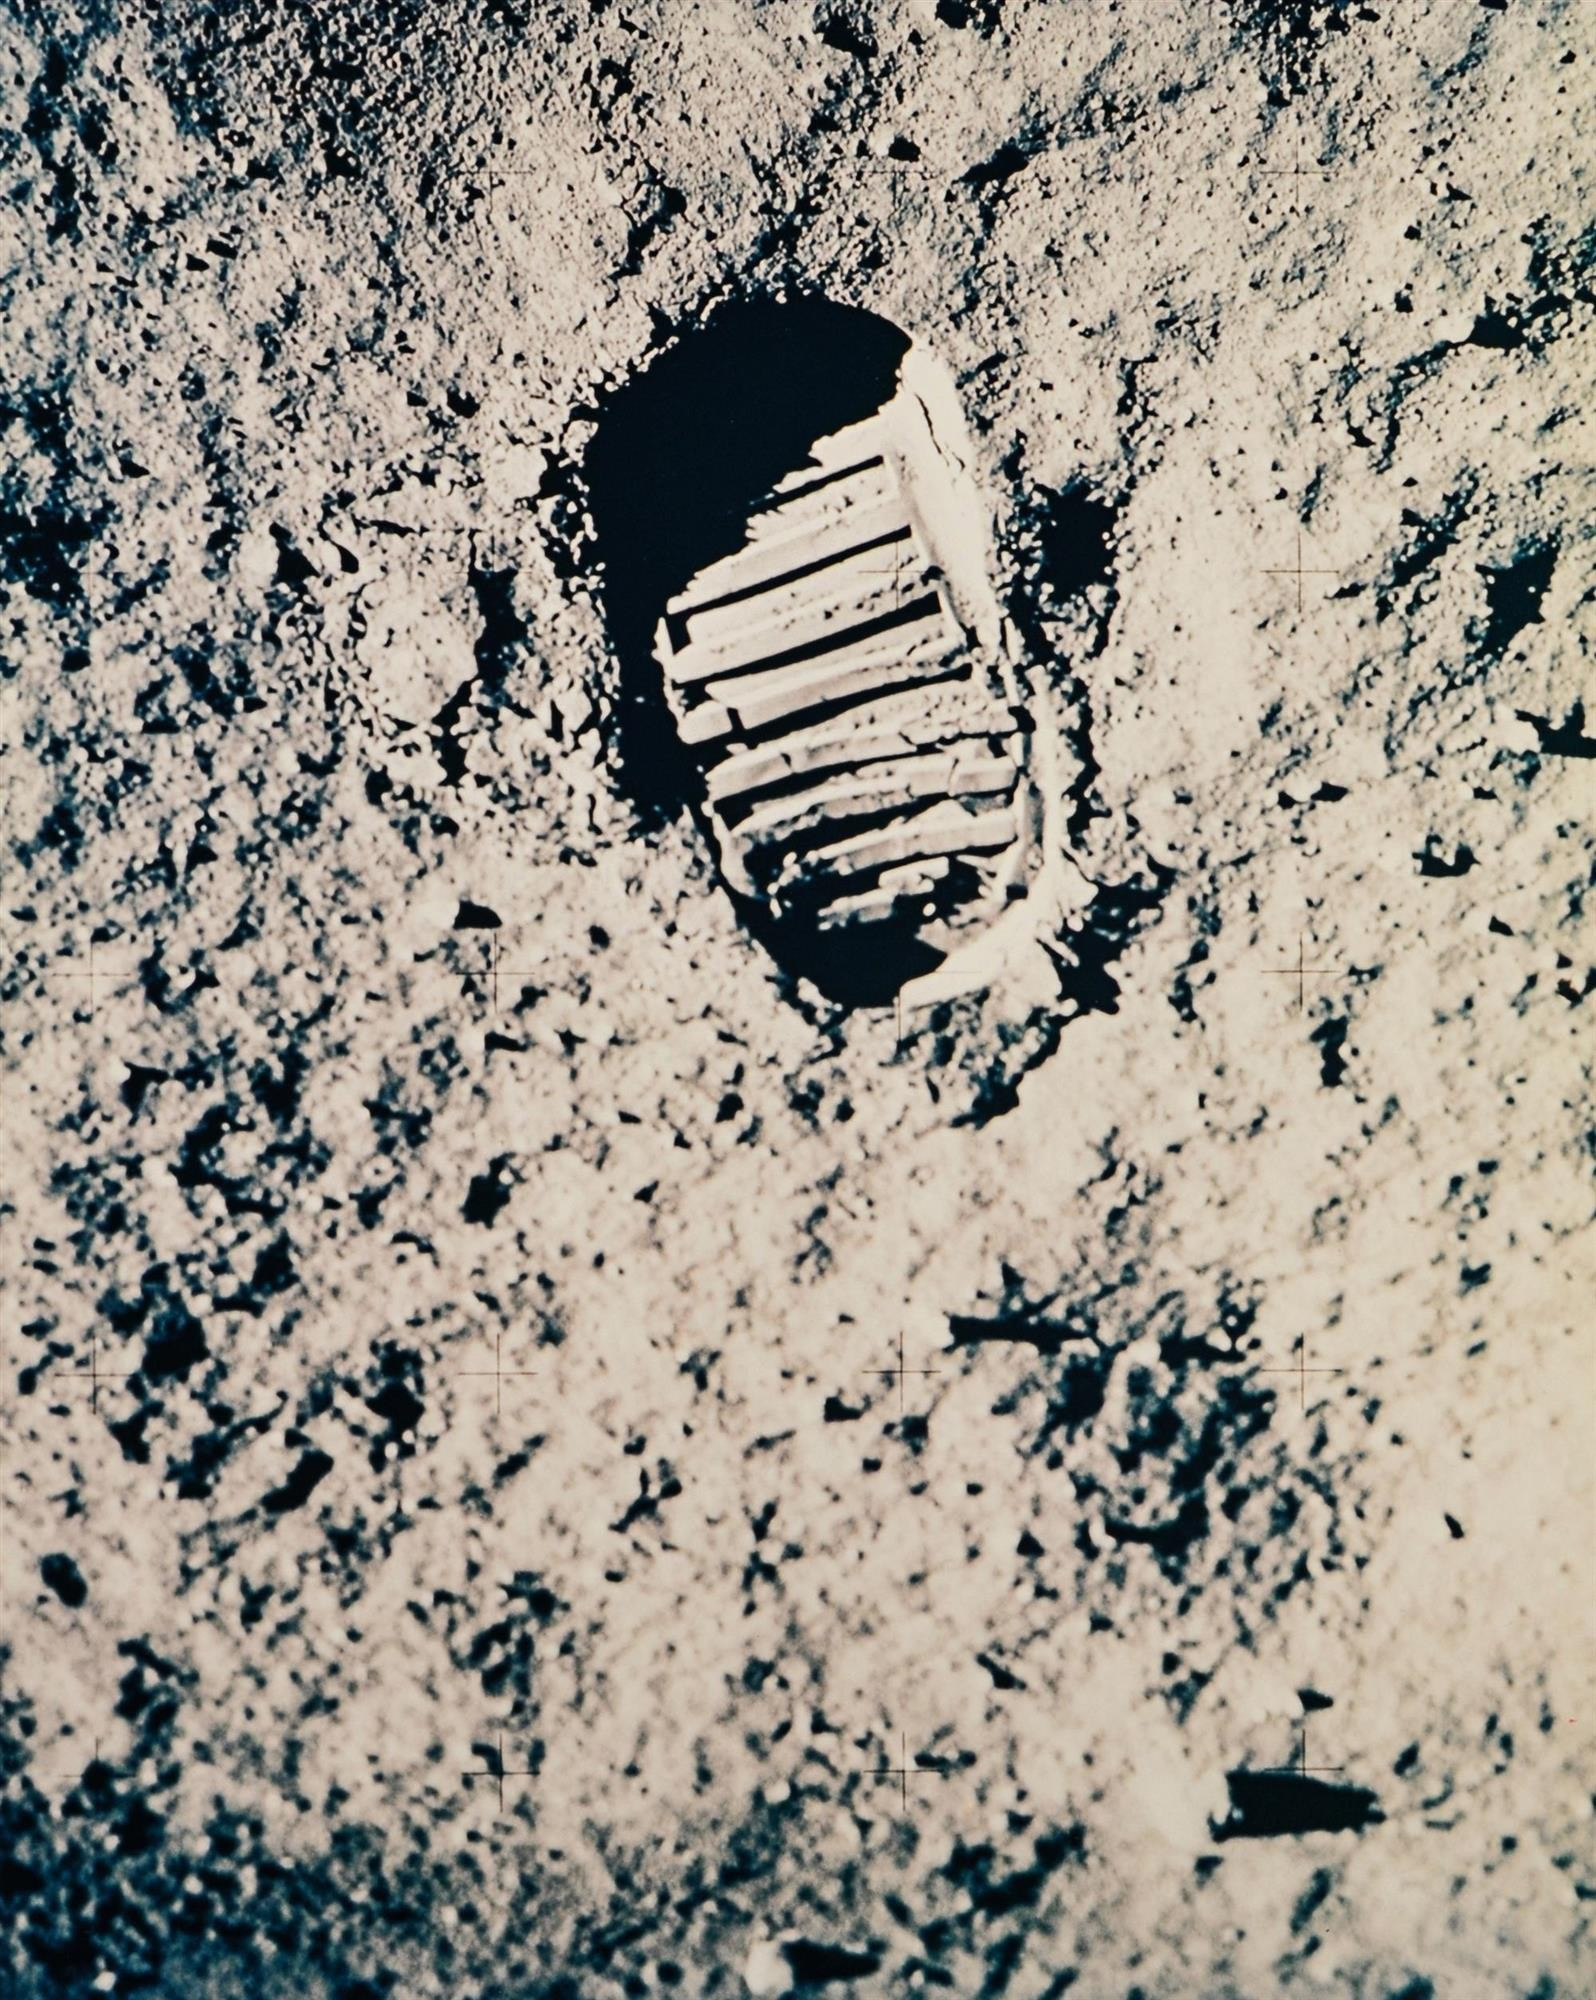 La huella del hombre en la Luna